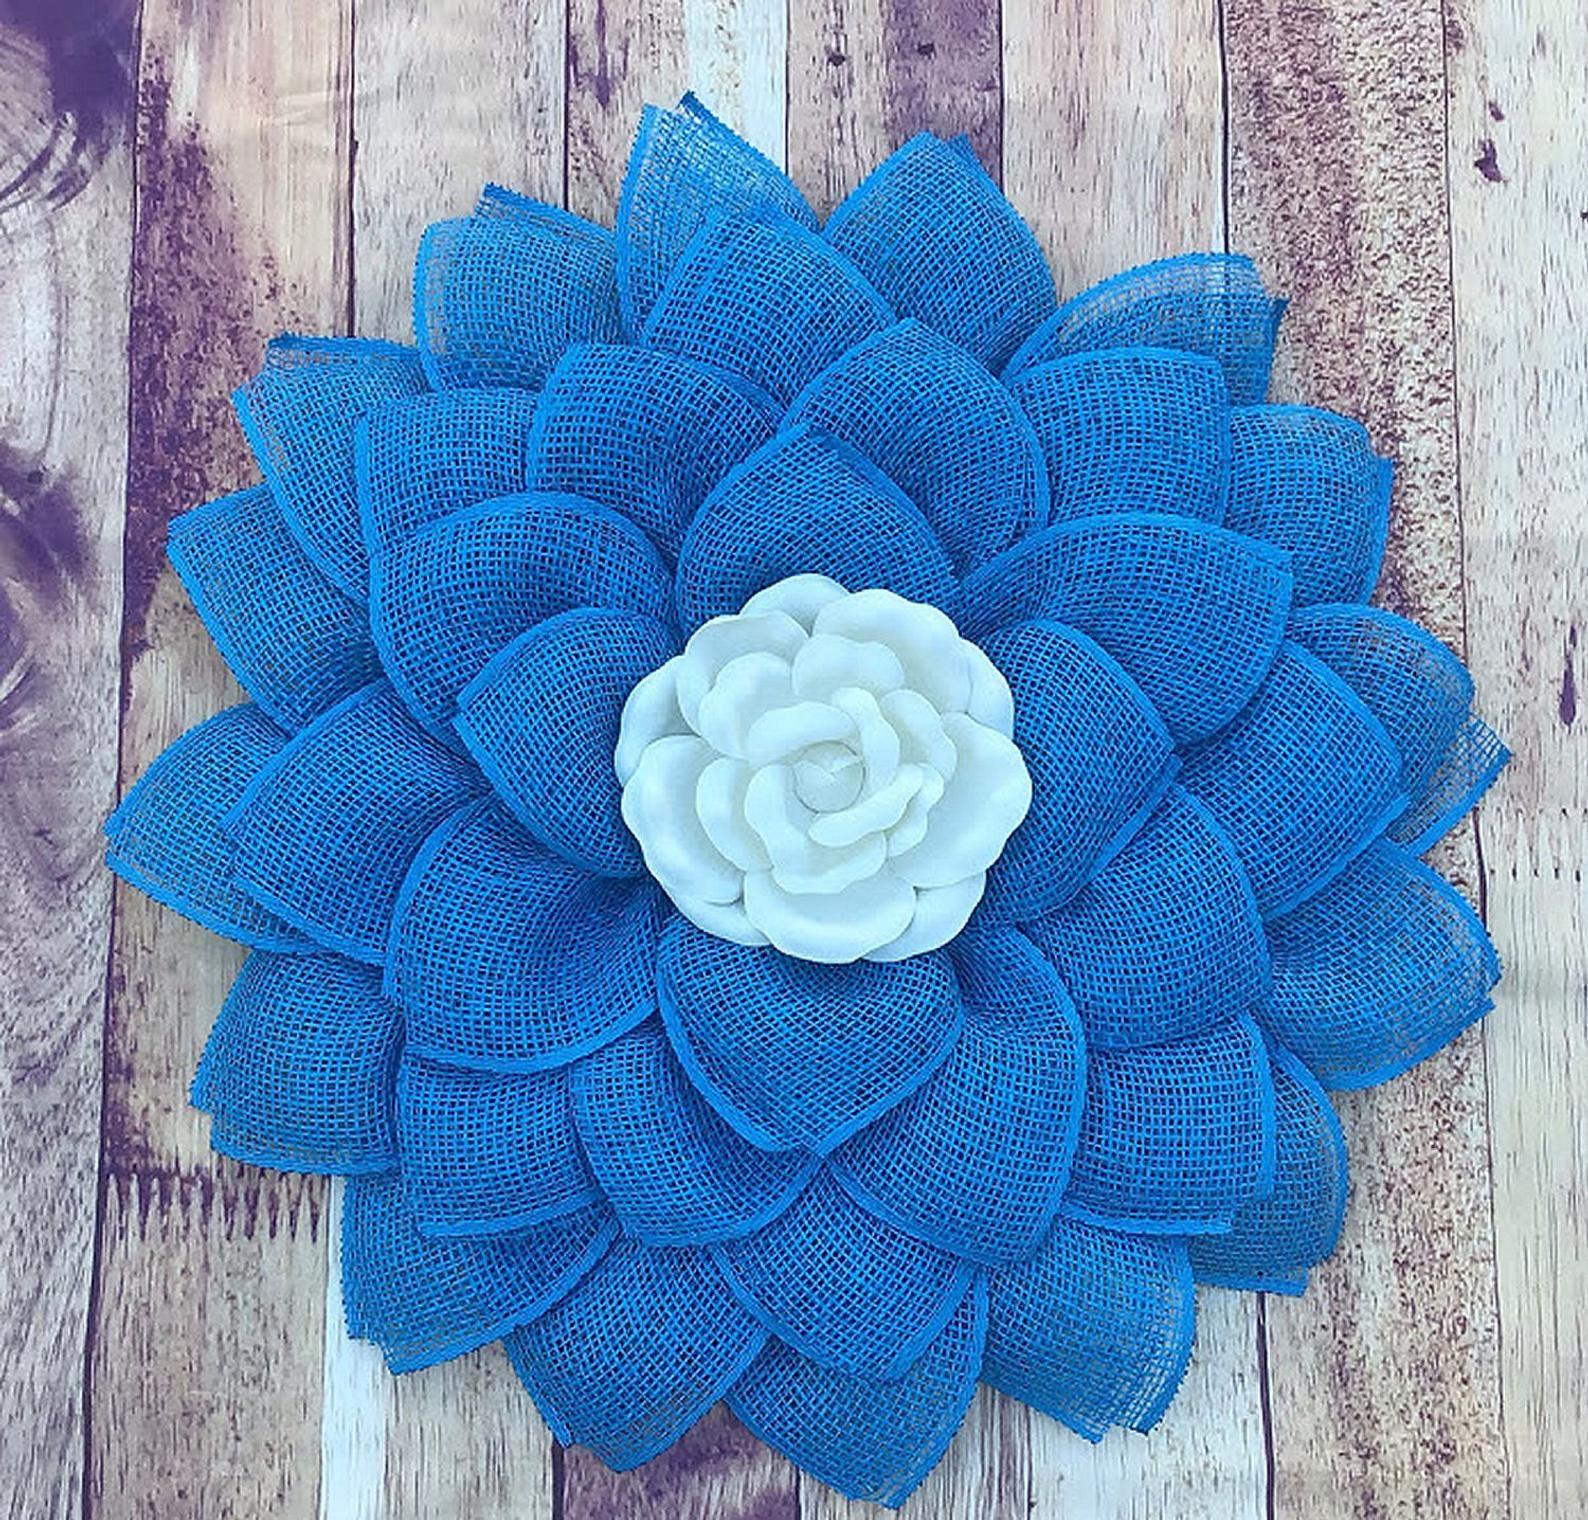 Blue Flower Wreath, Little Boy's Room Decor, Everyday